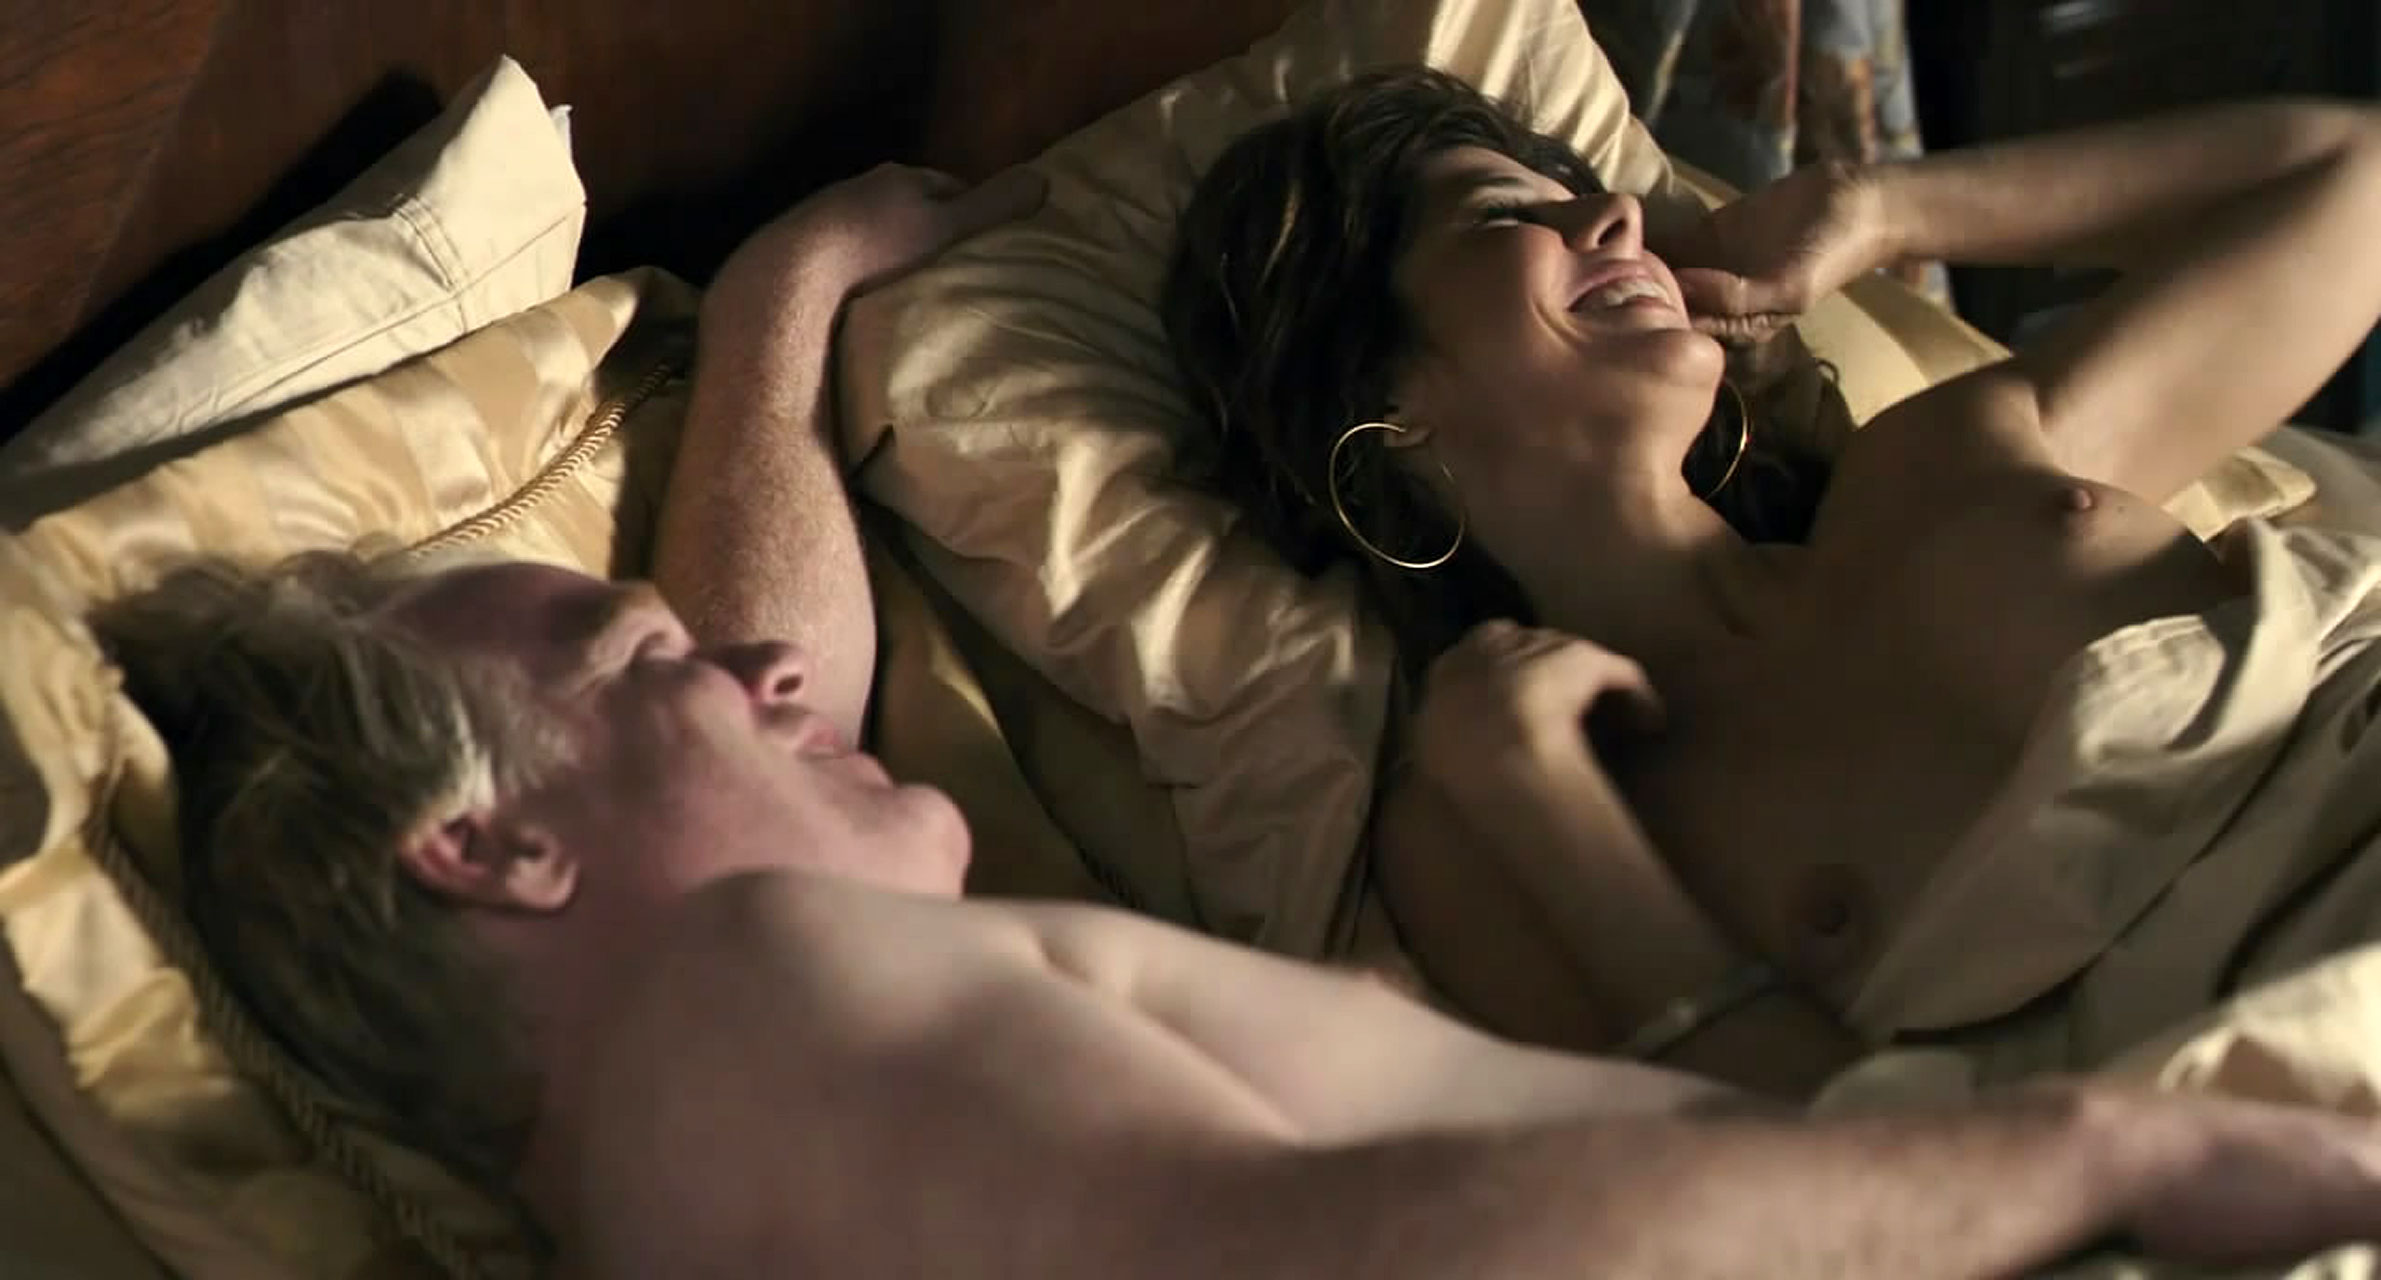 Сцени сексу у кіно 3 фотография